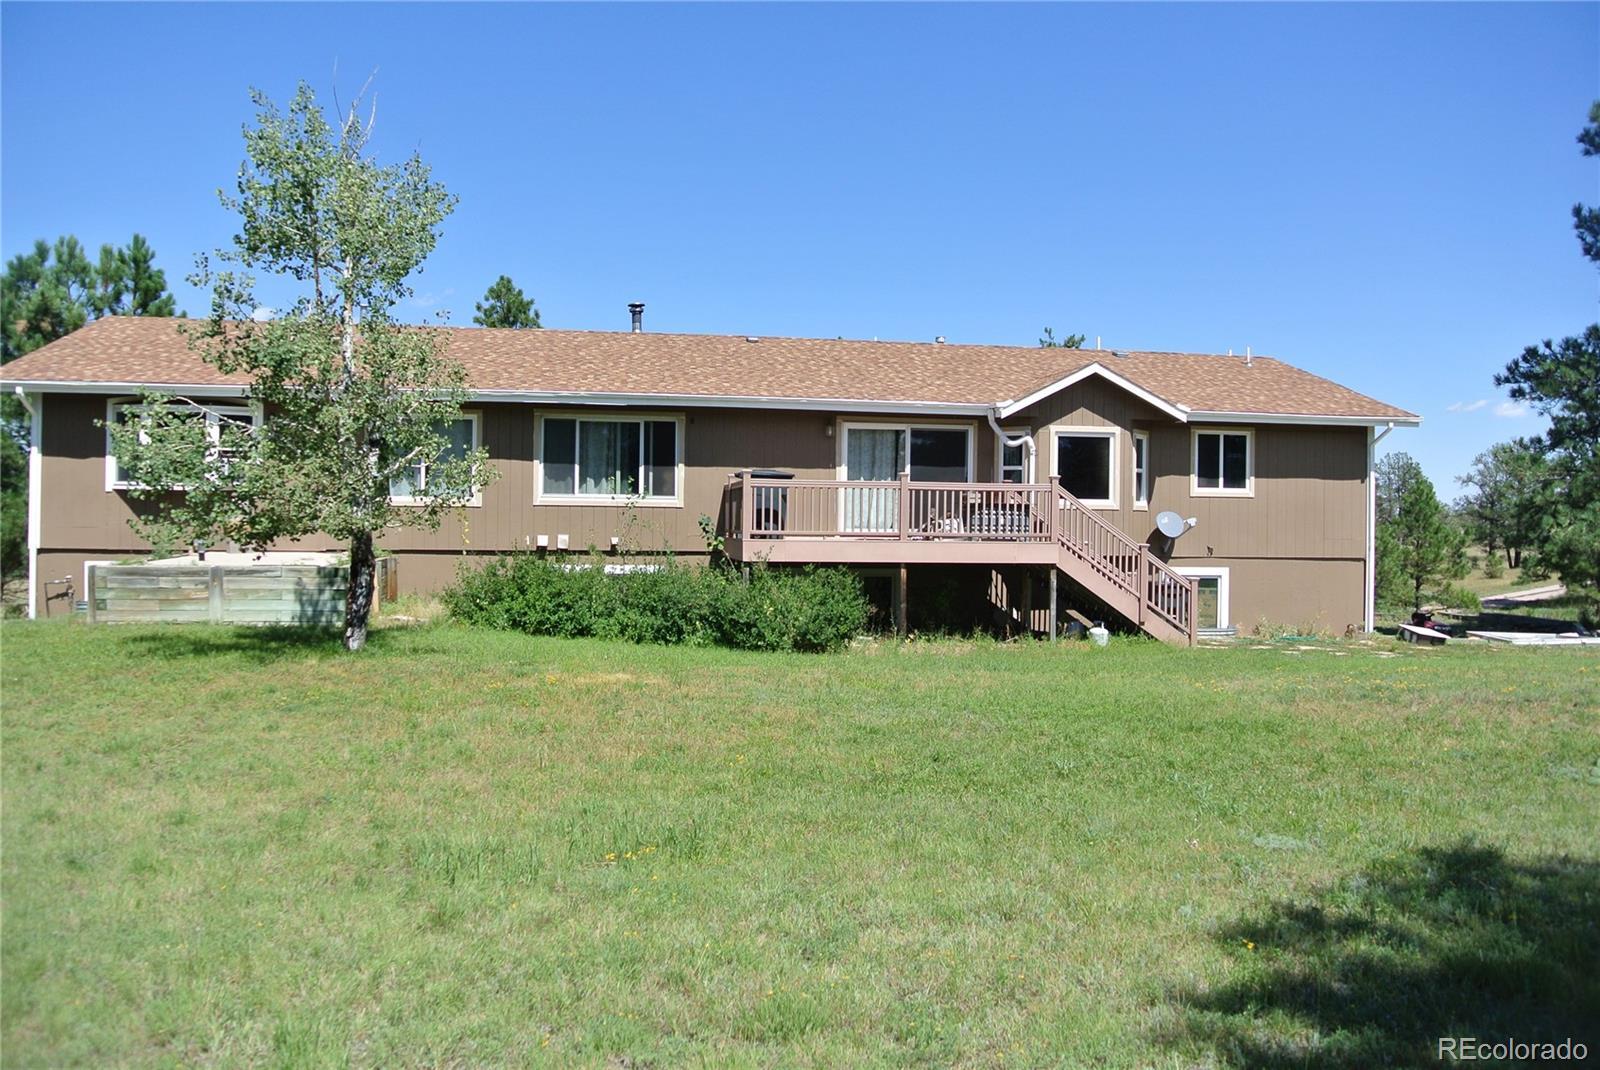 29495 County Road 93, Kiowa, CO 80117 - Kiowa, CO real estate listing